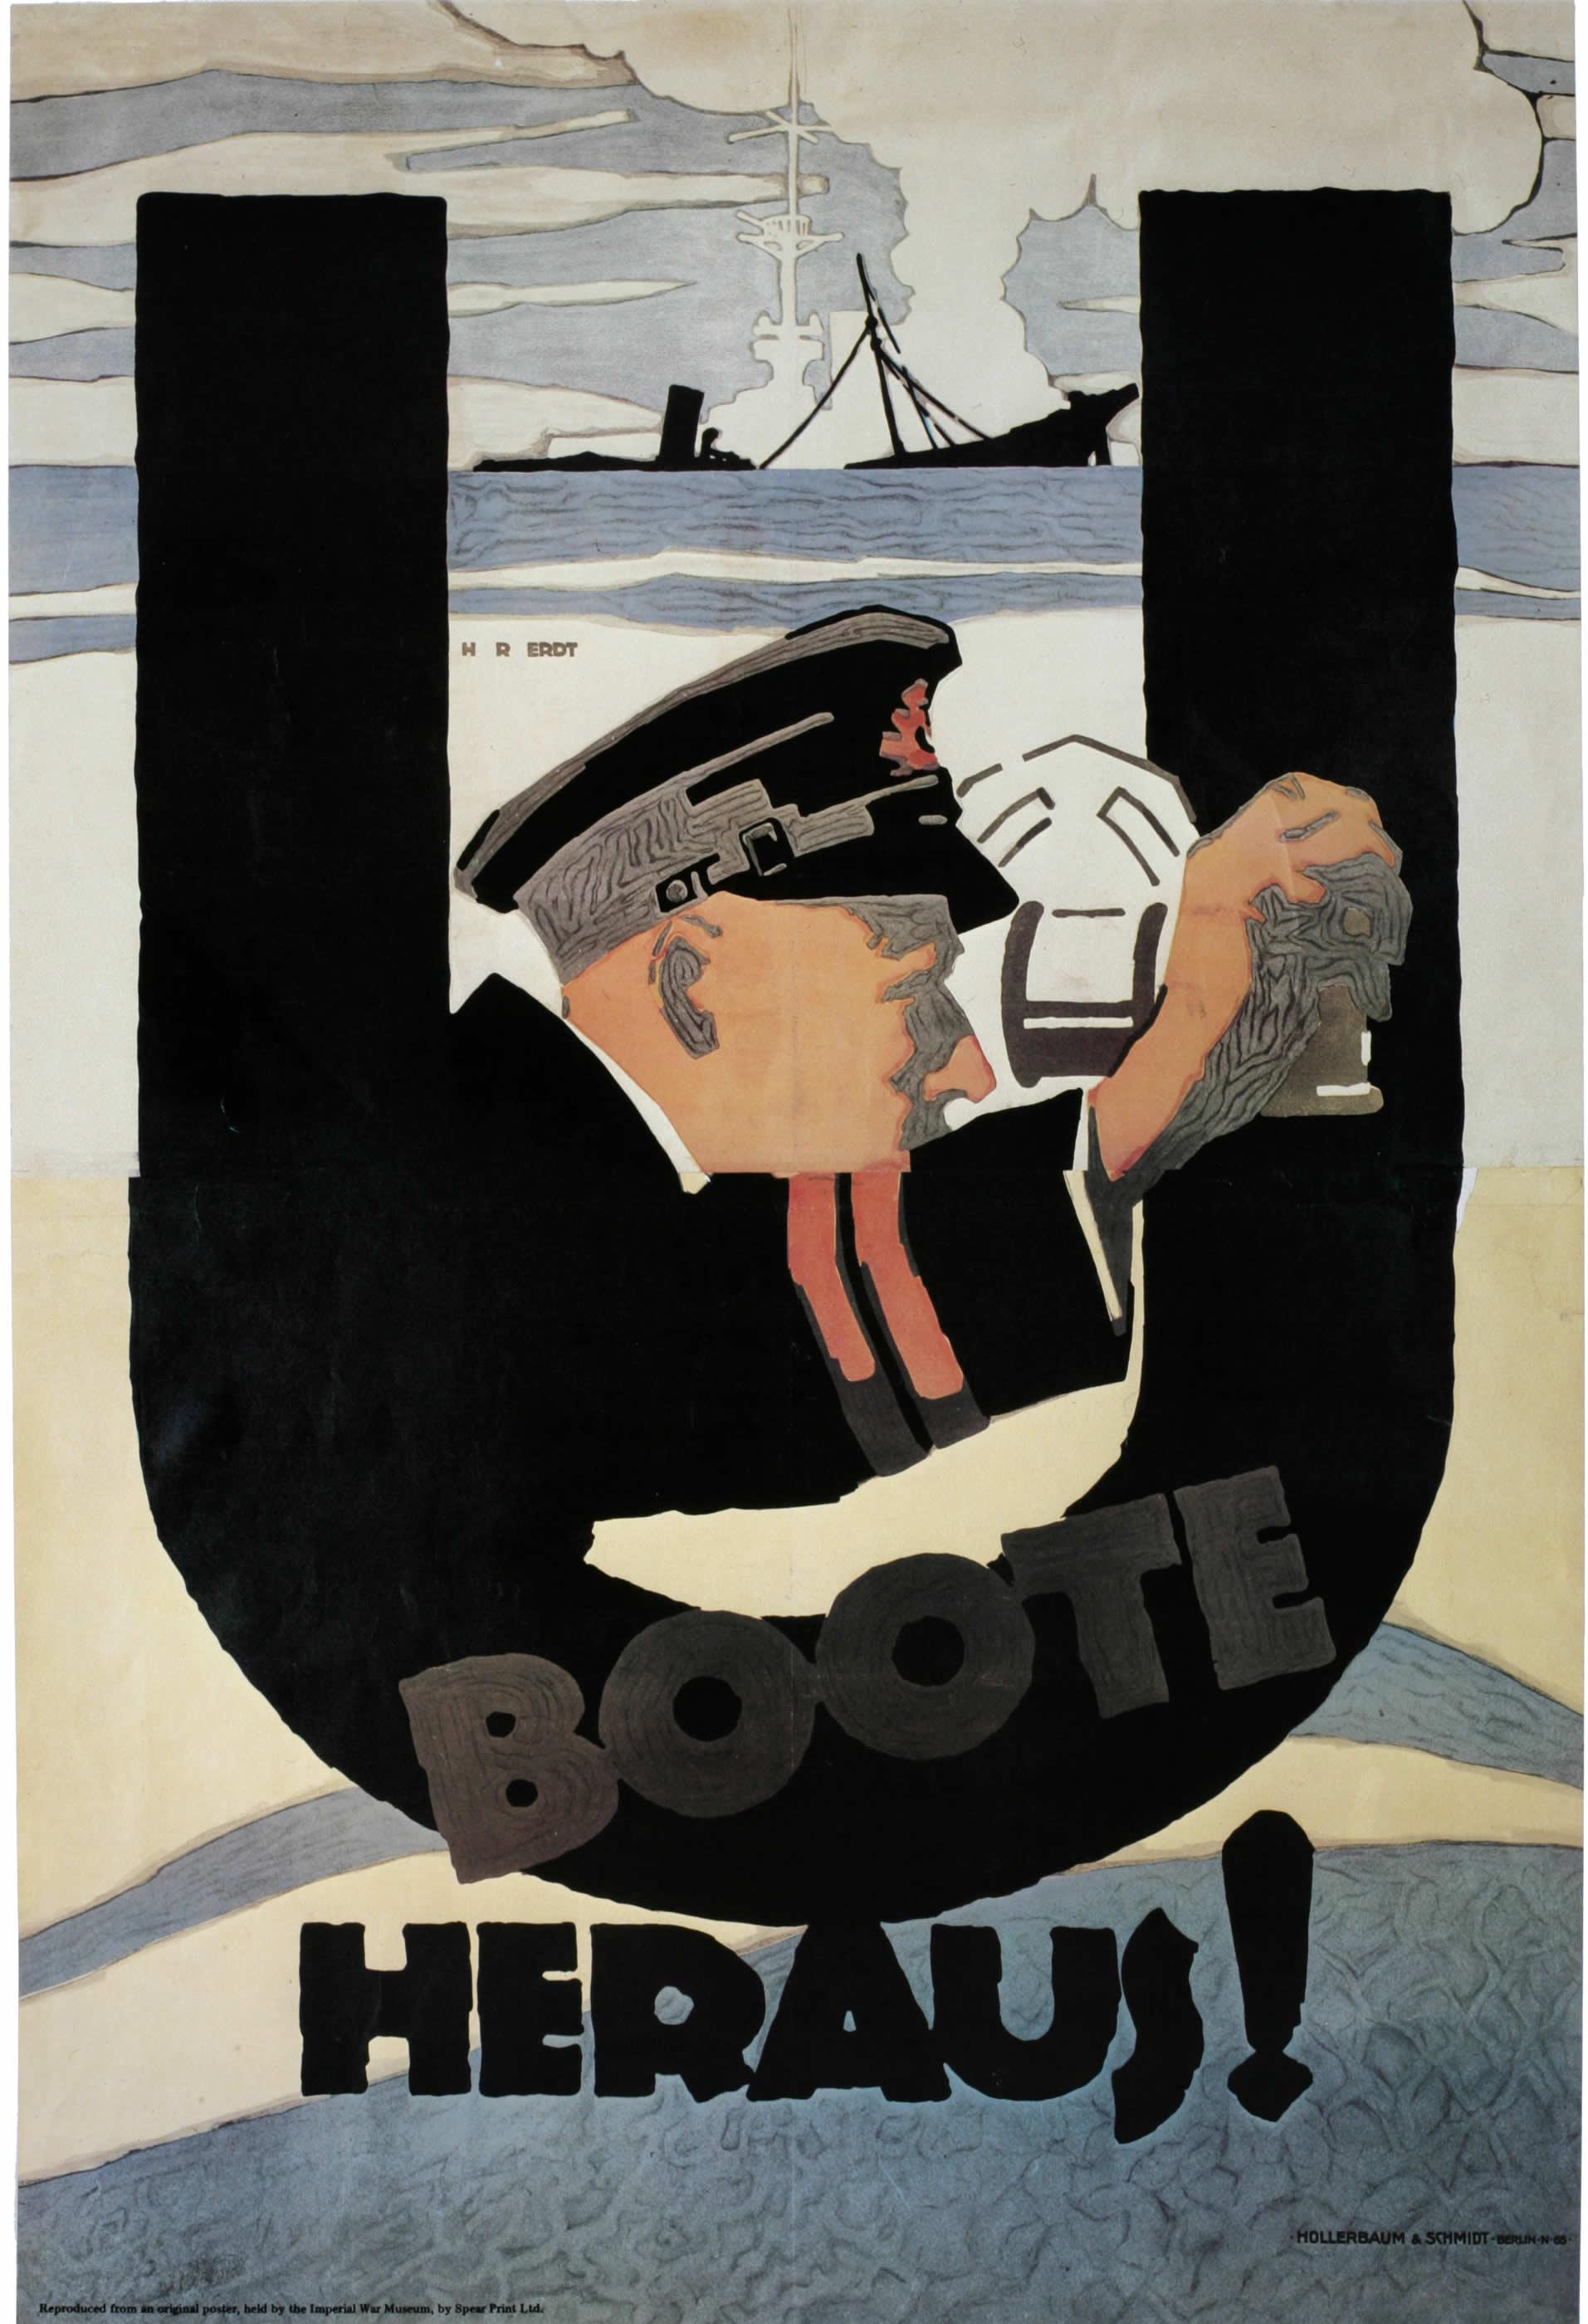 U Boote Heraus! (Lancement de U-boot!)